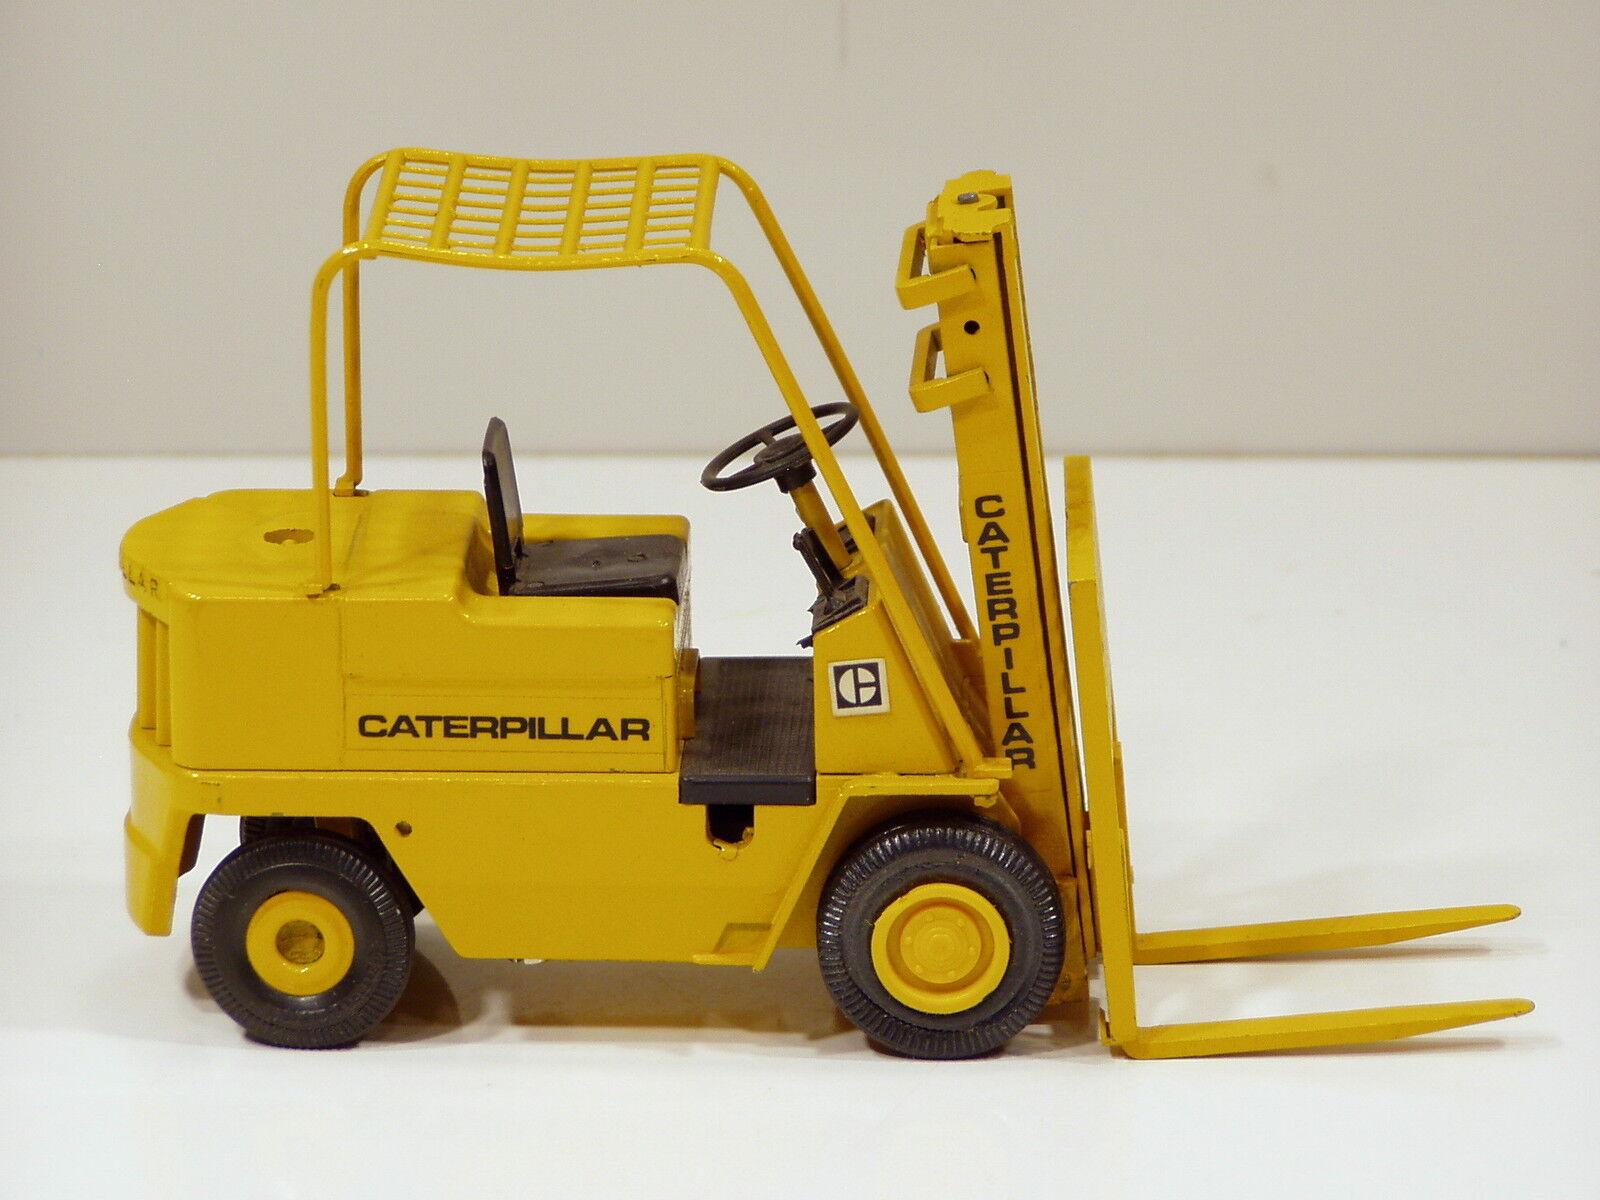 Caterpillar V60 Forklift - o c - - - 1 25 - Gescha N.MIB 5e8ea4